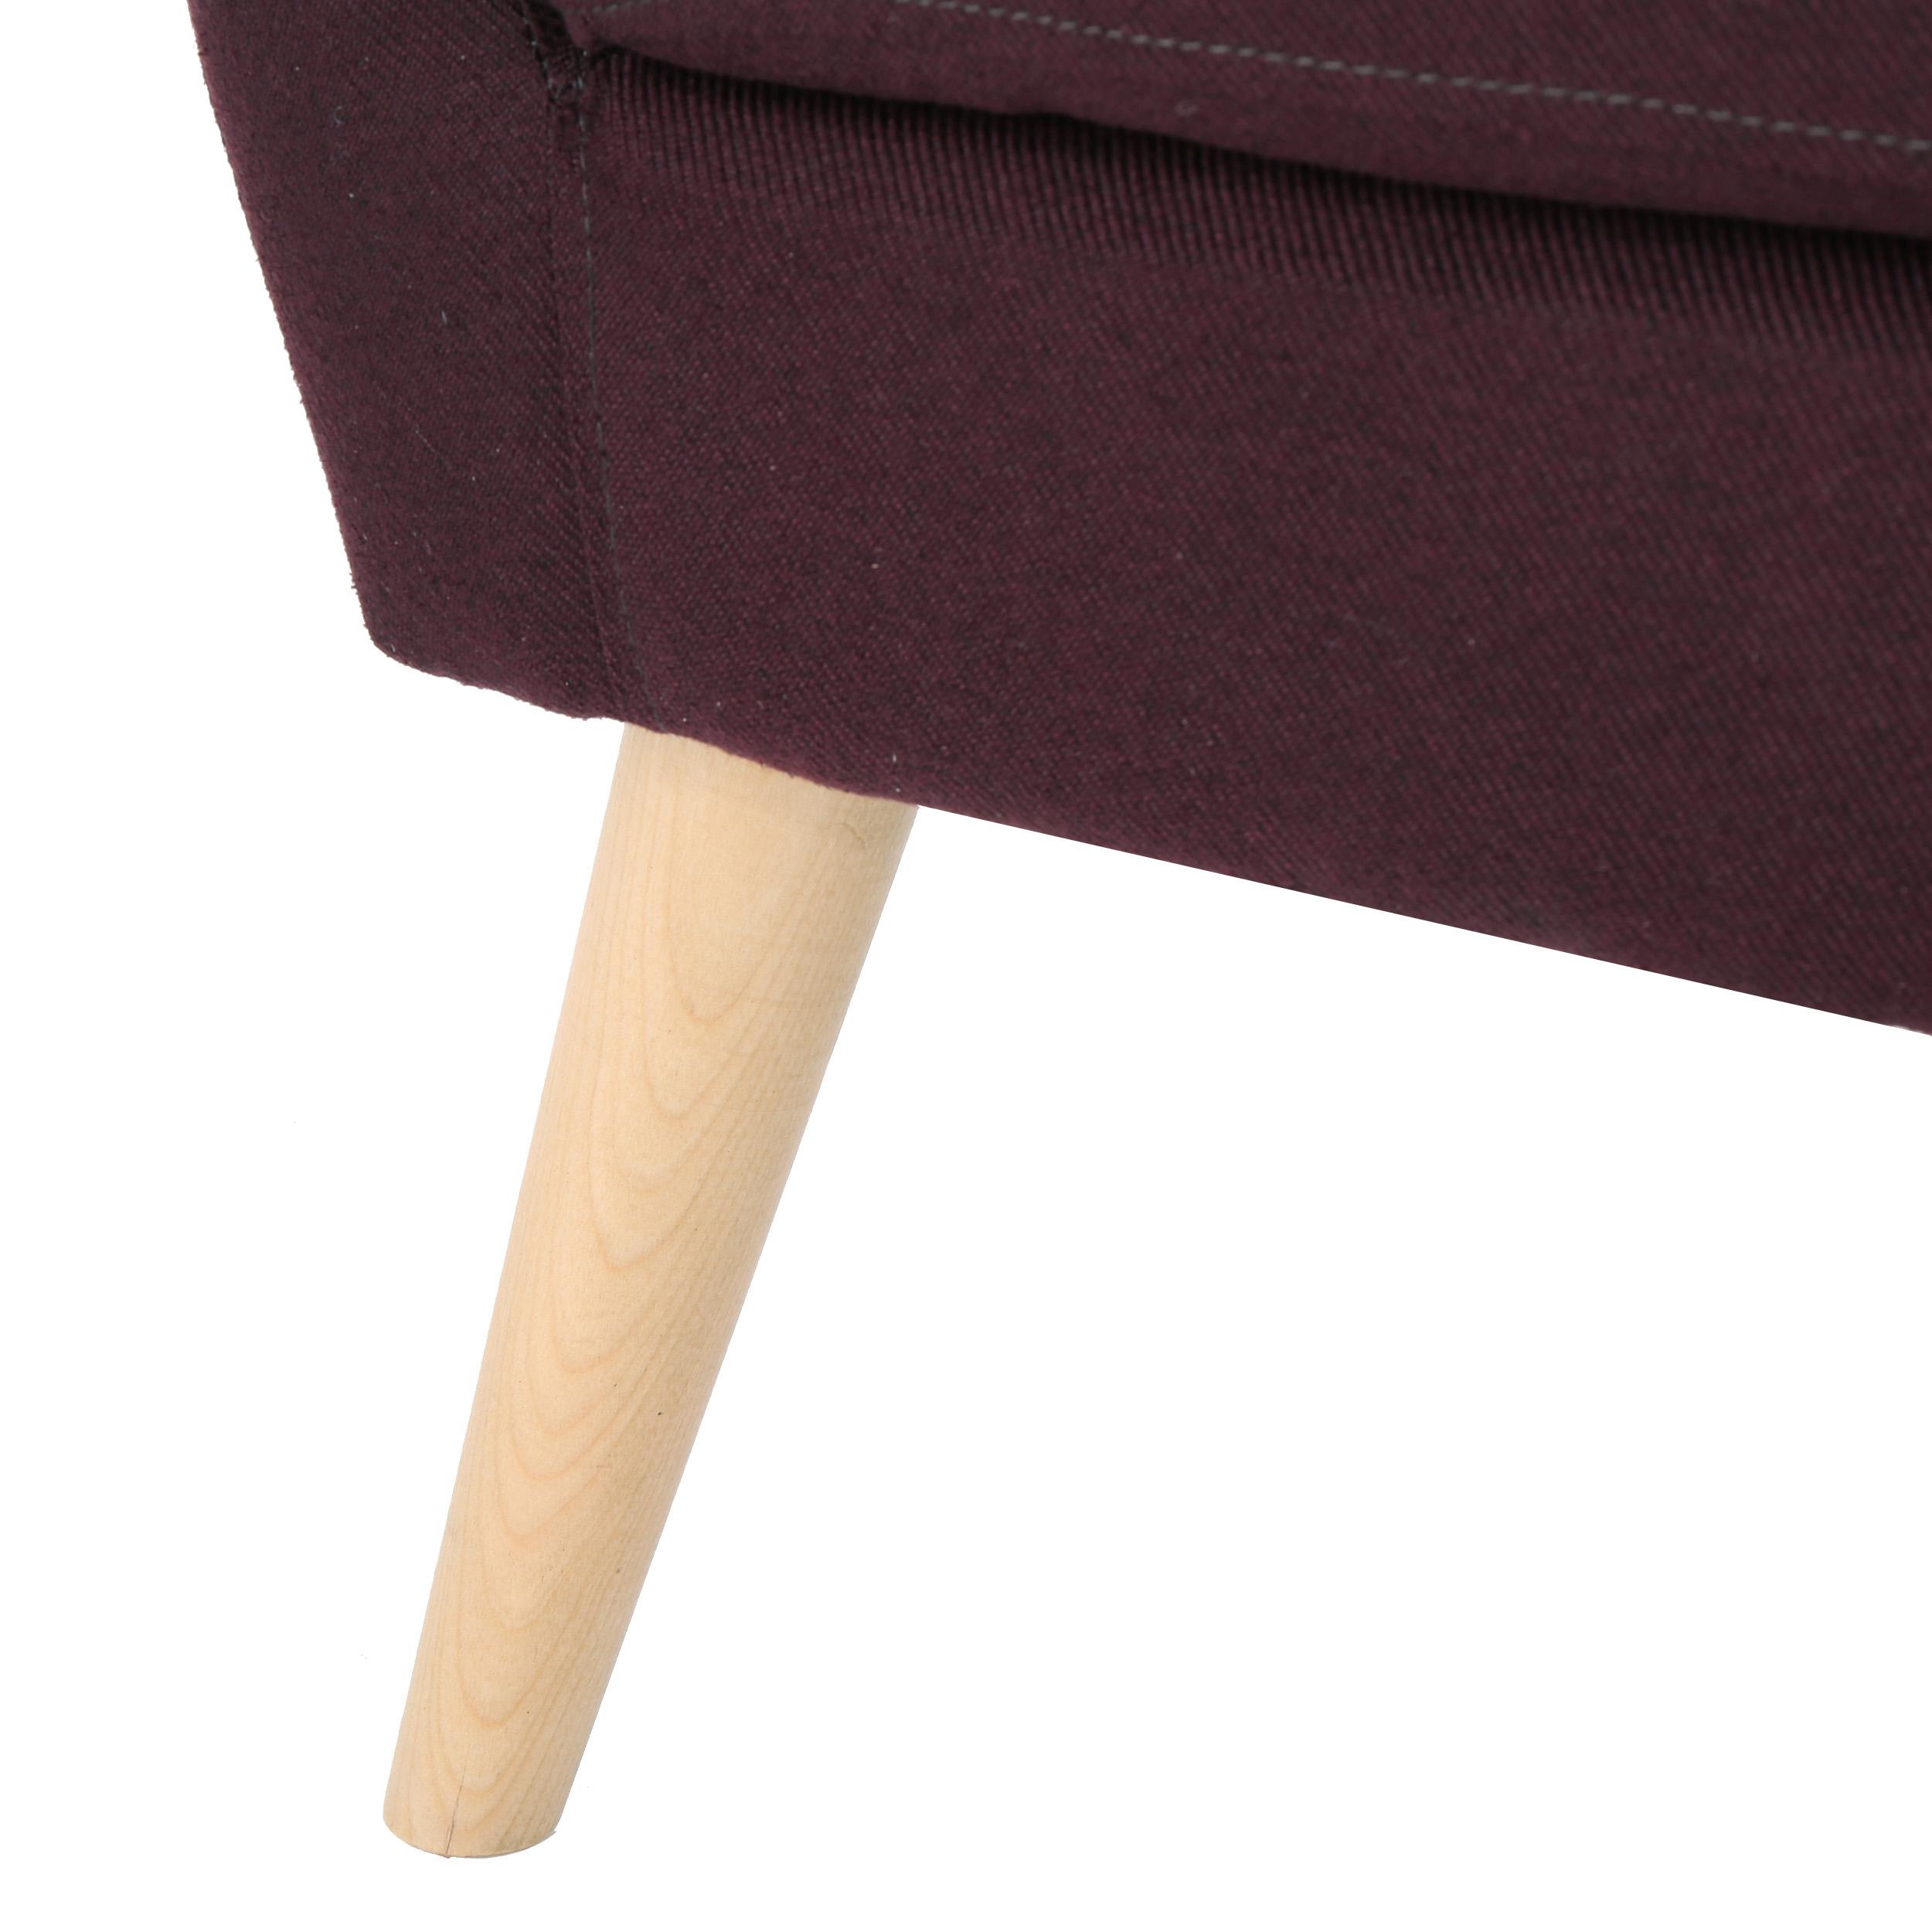 Astonishing Madelyn Mid Century Modern Fabric Club Chair Ebay Machost Co Dining Chair Design Ideas Machostcouk